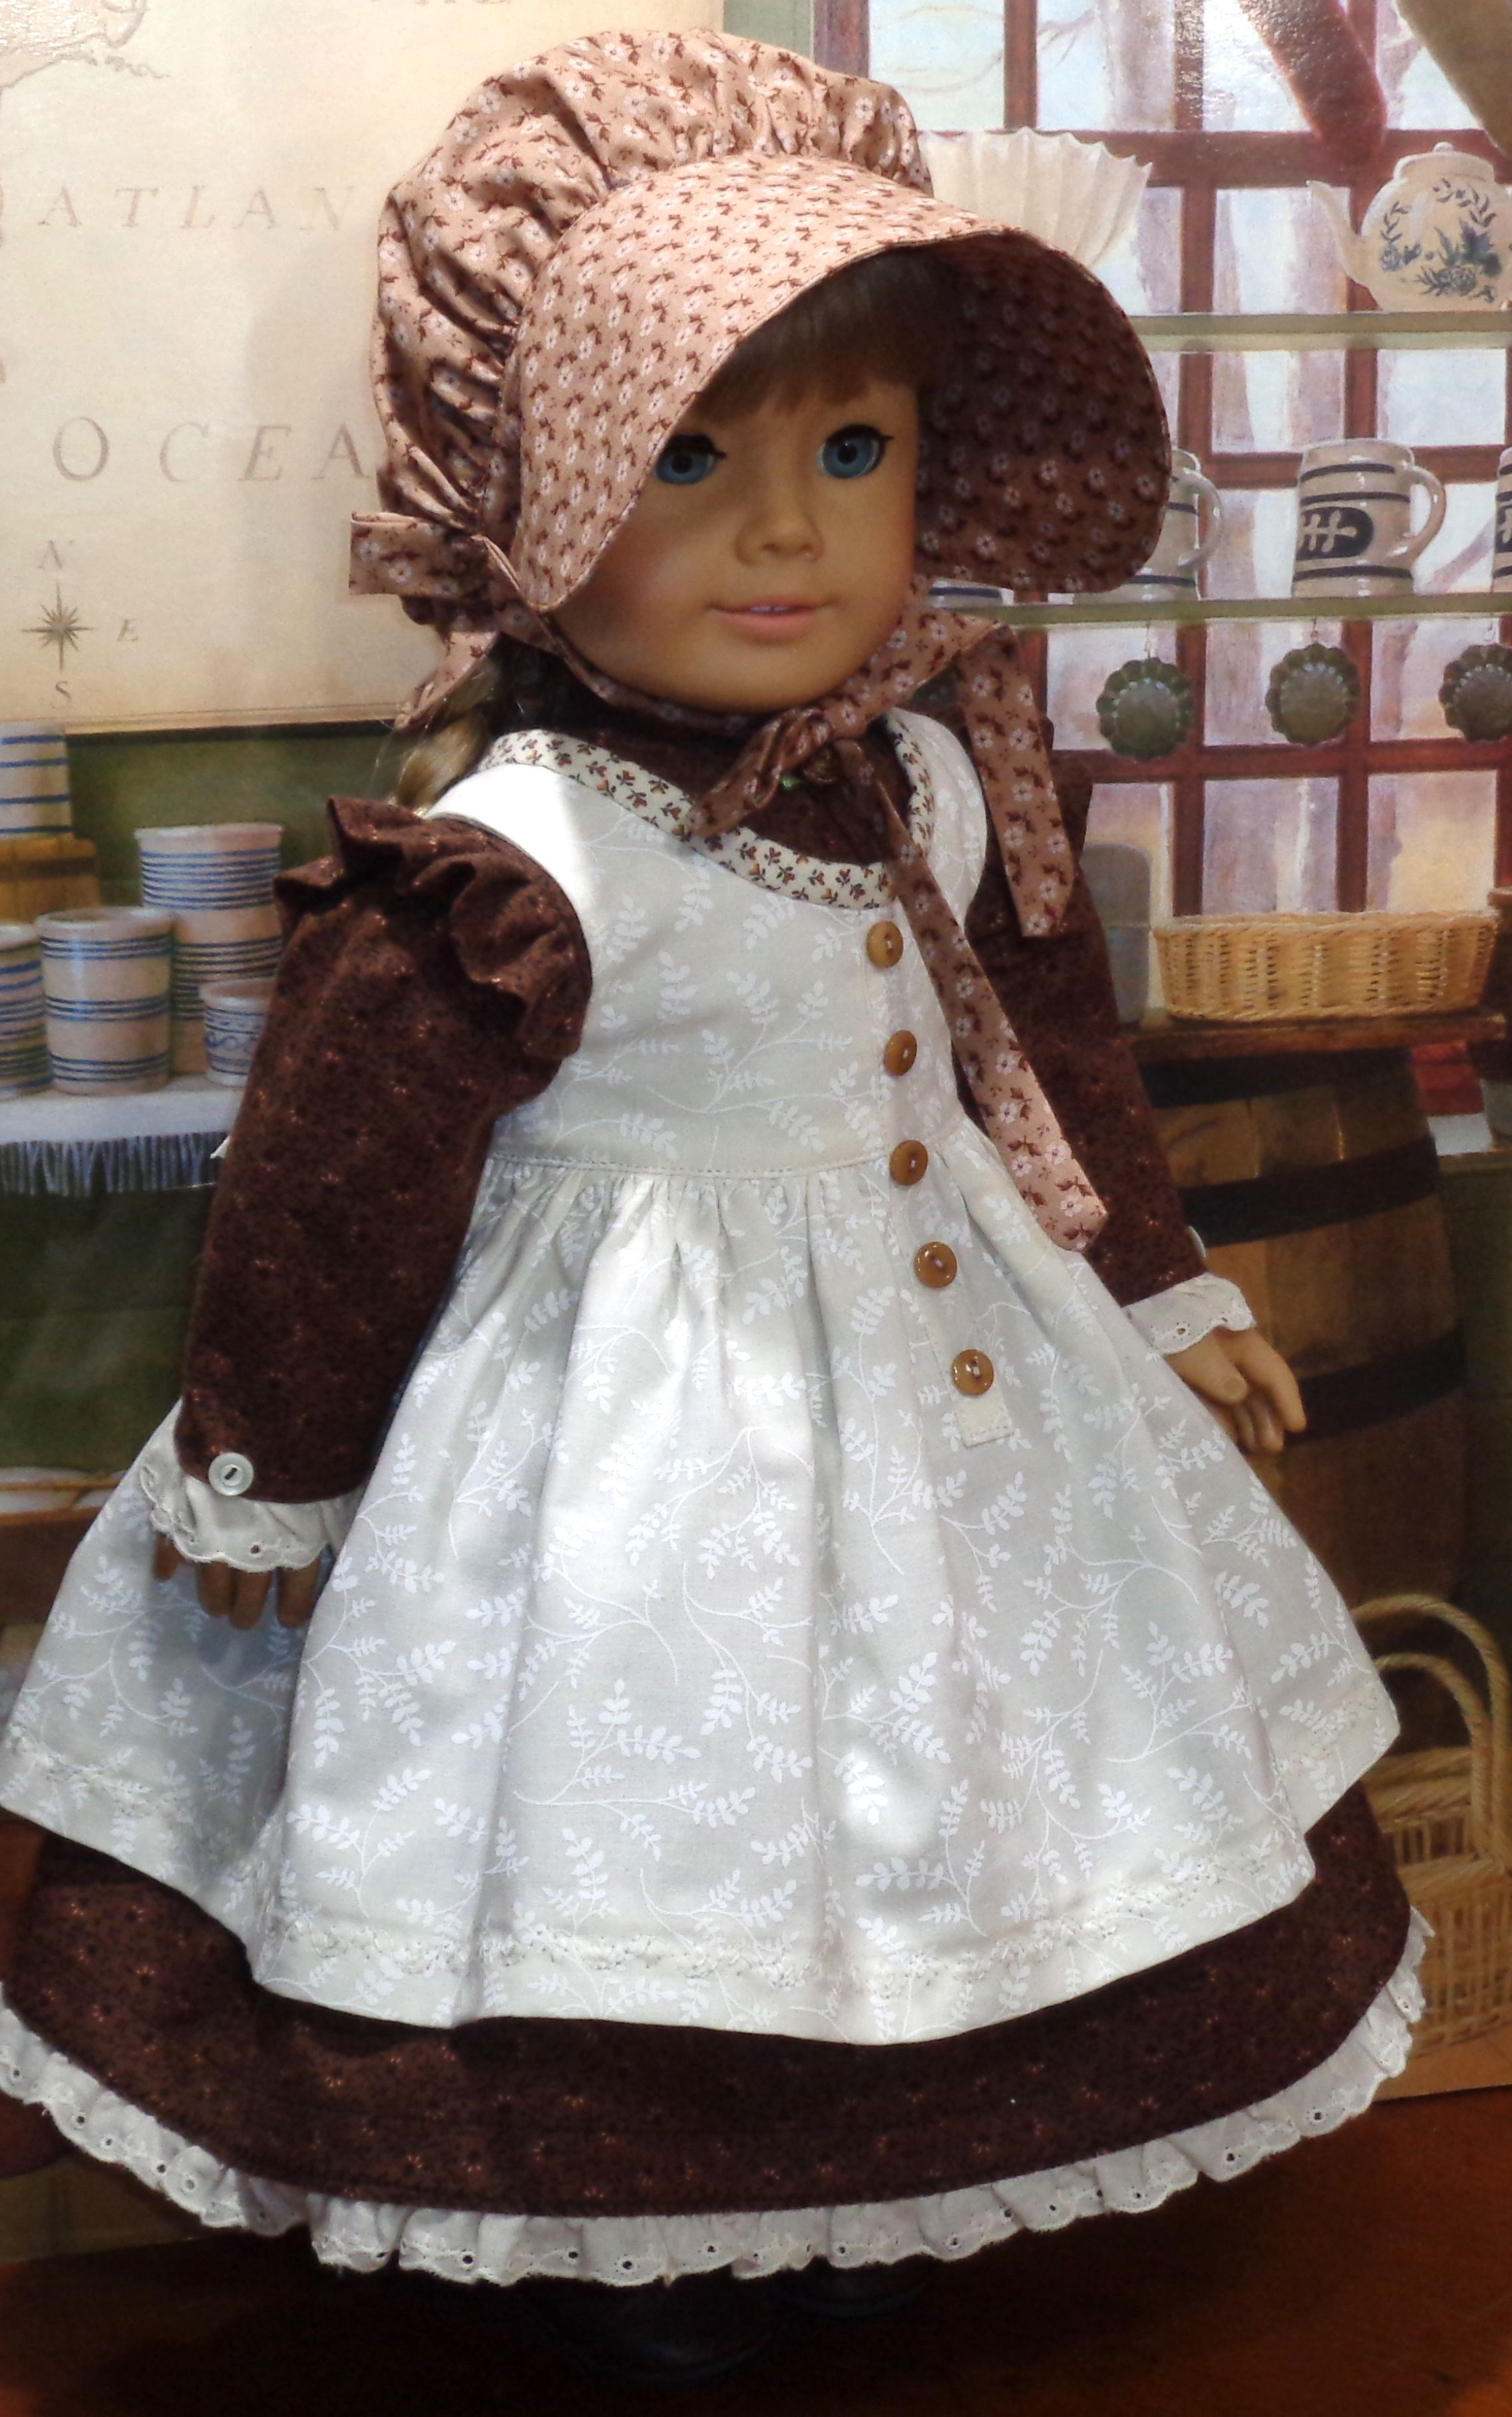 Doll dress p #historicaldollclothes Doll dress p #dolldresspatterns